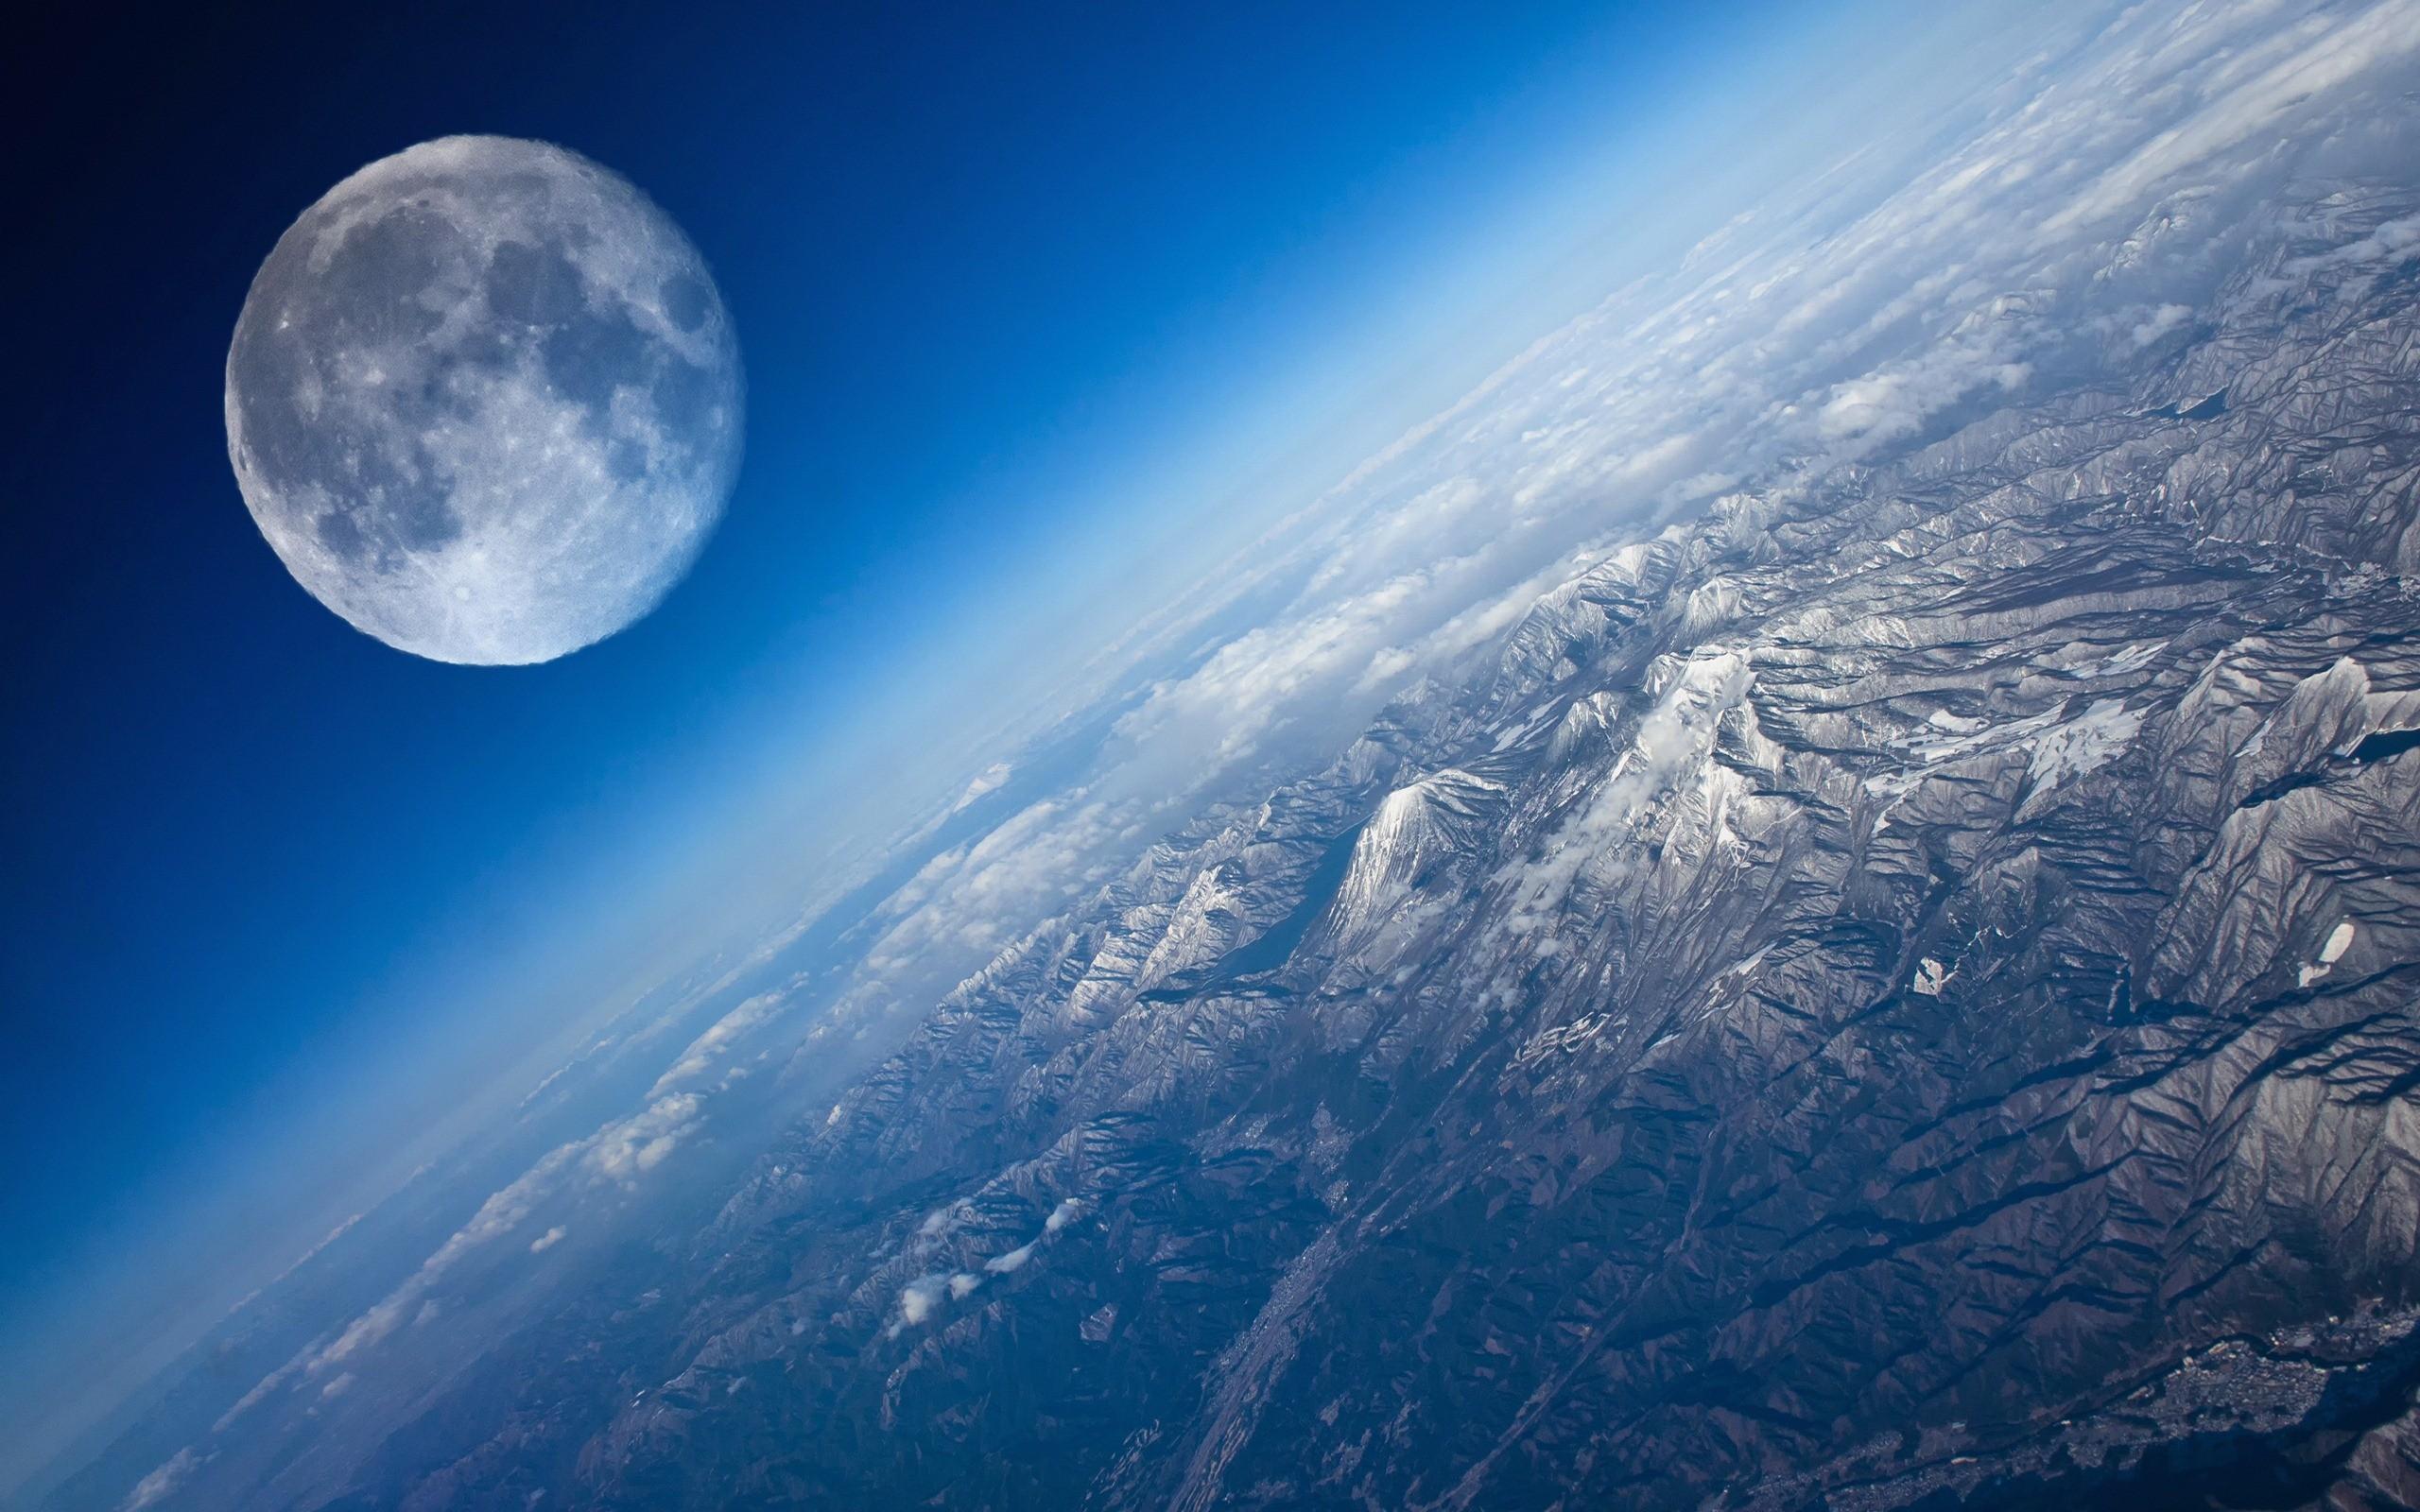 Frozen Moon Desktop Full HD Wallpapers Windows 10 Backgrounds 2560x1600